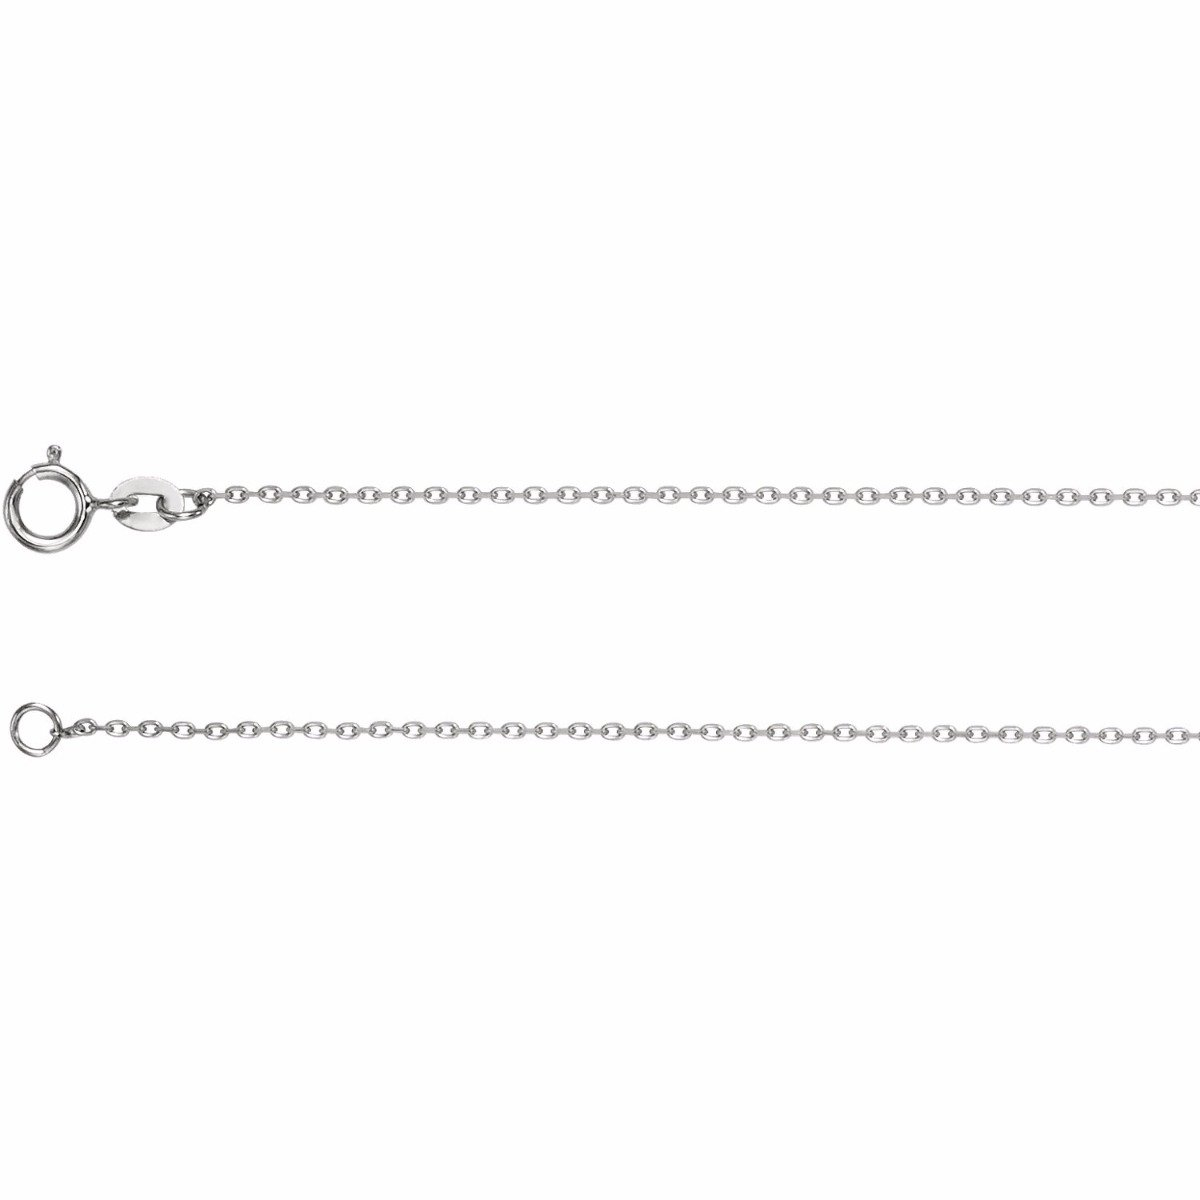 1mm diamond cut cable chain wg